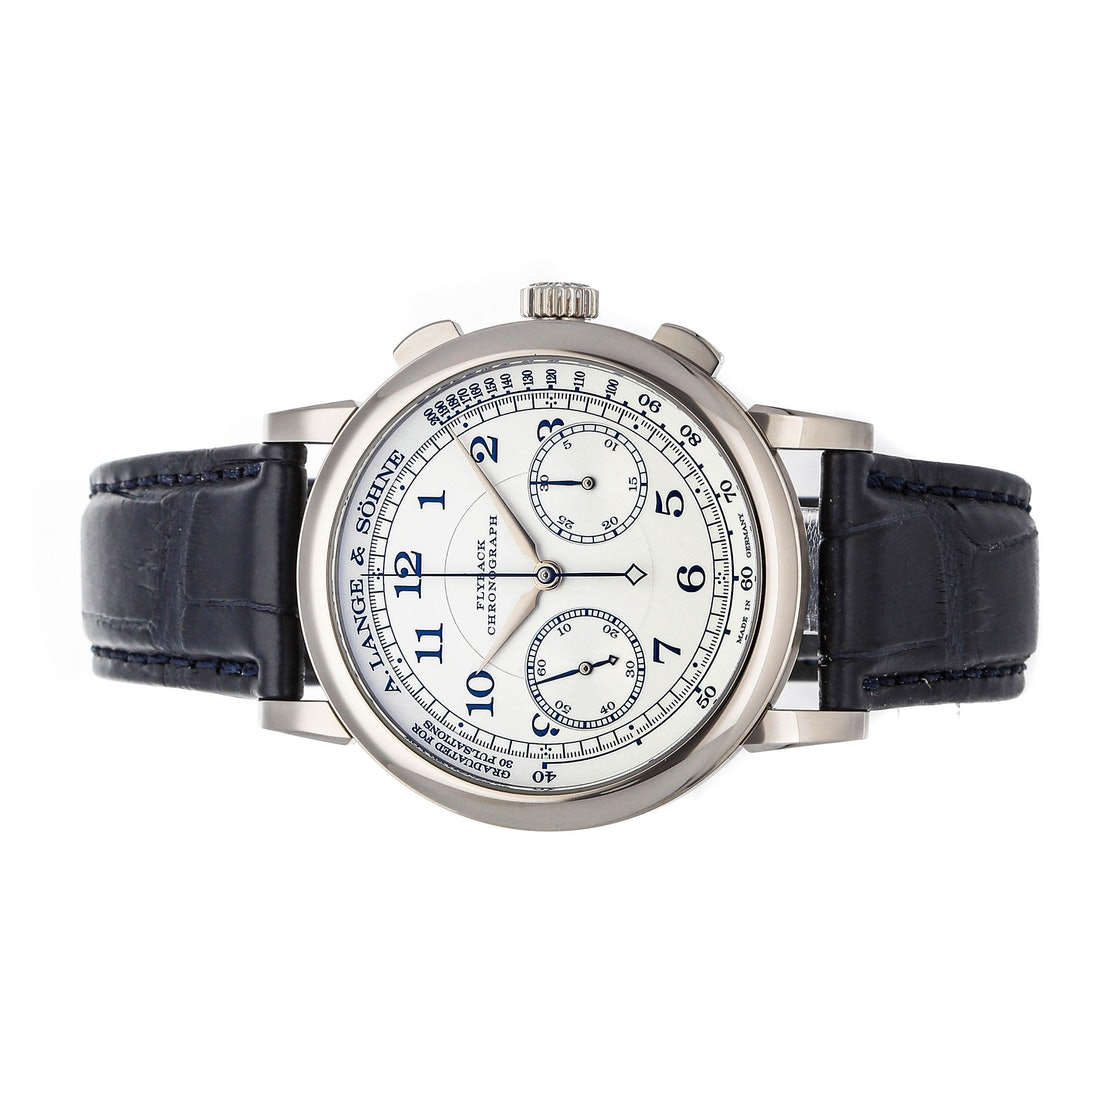 A. Lange & Sohne 1815 Flyback Chronograph 414.026